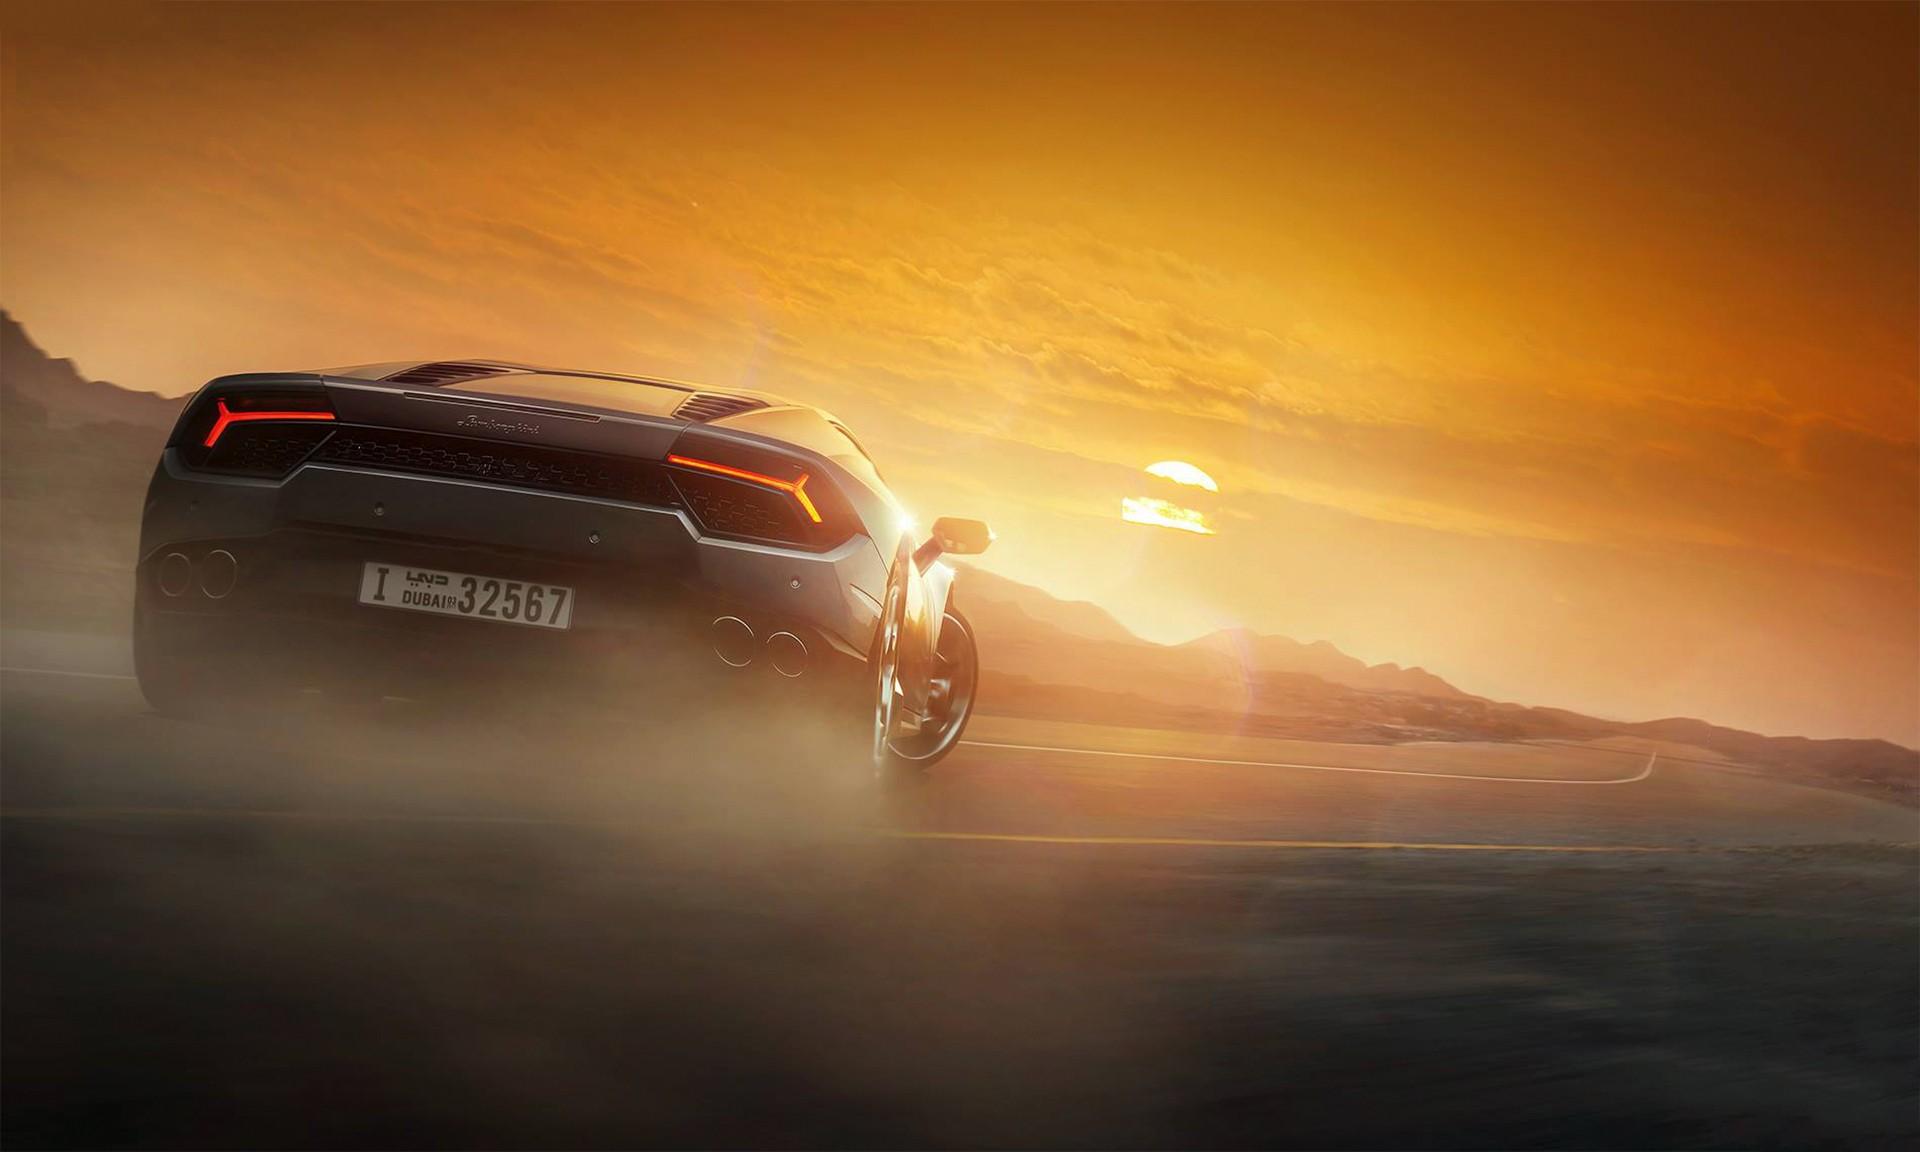 Lamborghini Cars Photos Wallpapers Wallpaper Sunset Car Vehicle Sunrise Morning Dusk